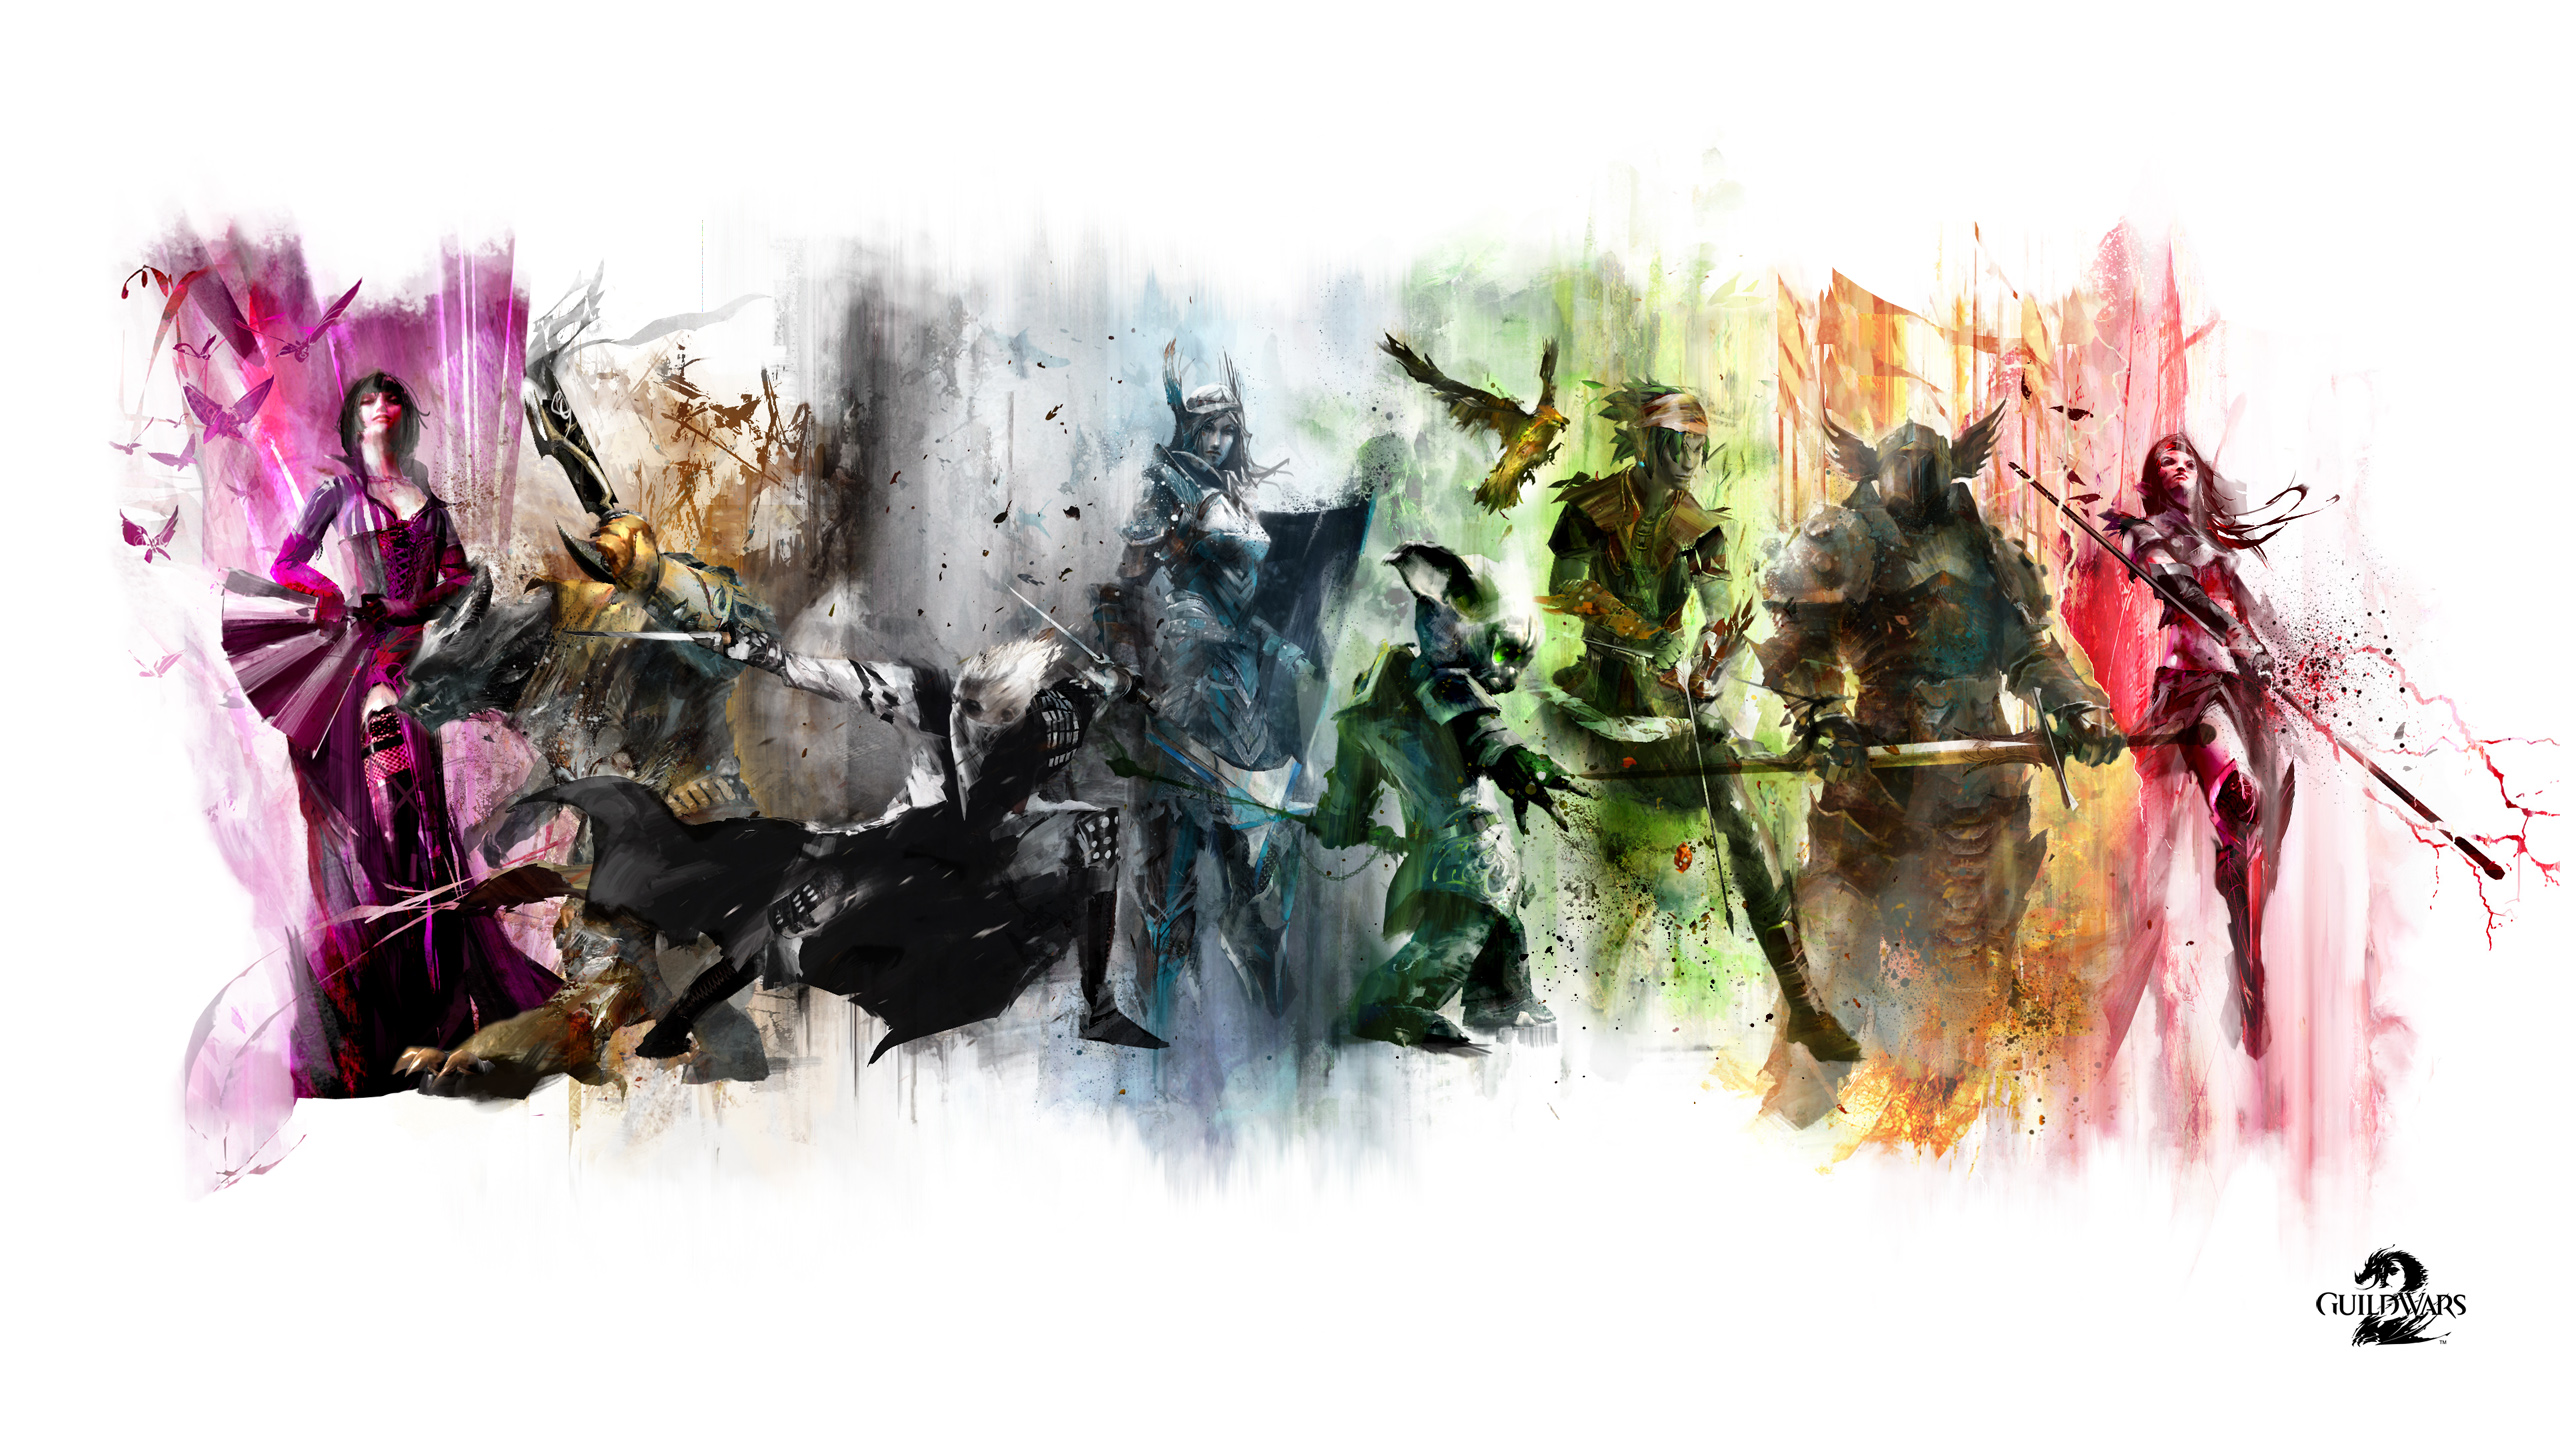 2048x1152 YouTube Channel Art Wallpaper - WallpaperSafari